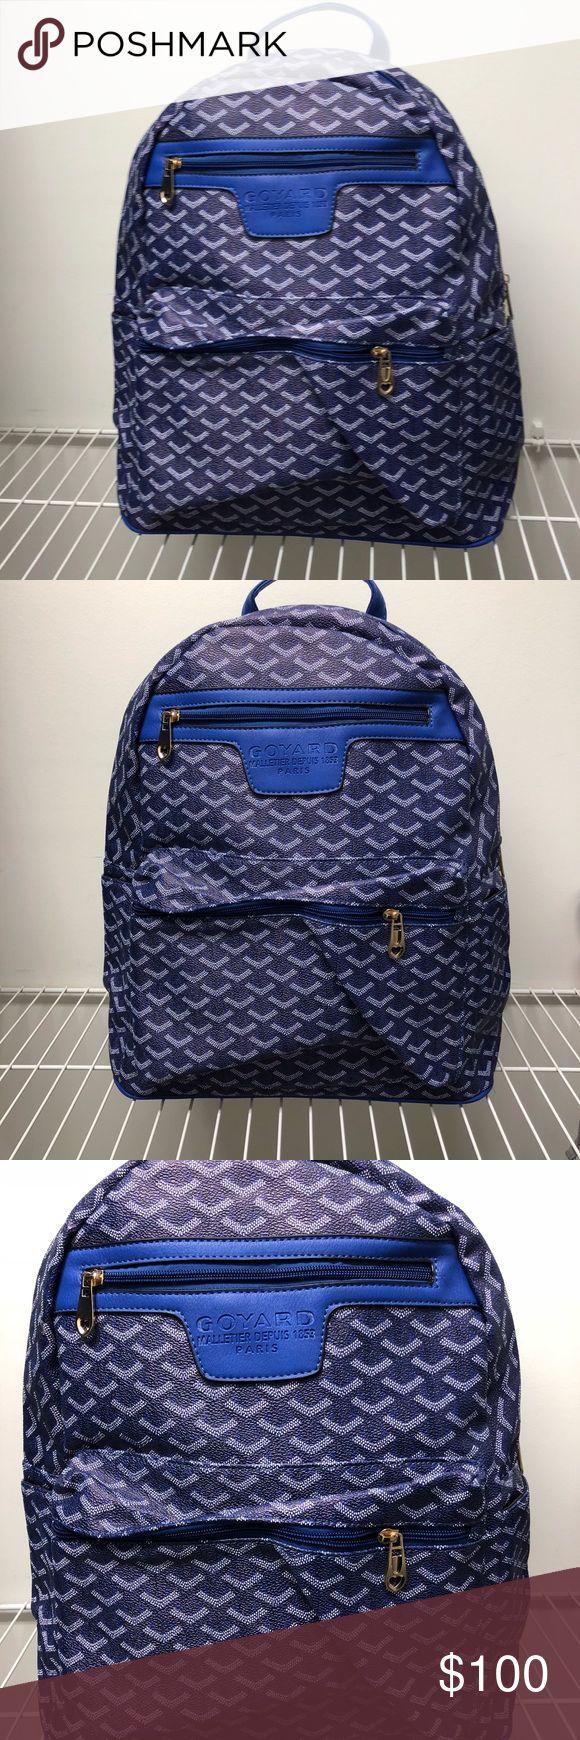 Goyard New great quality price firm Goyard Bags Backpacks